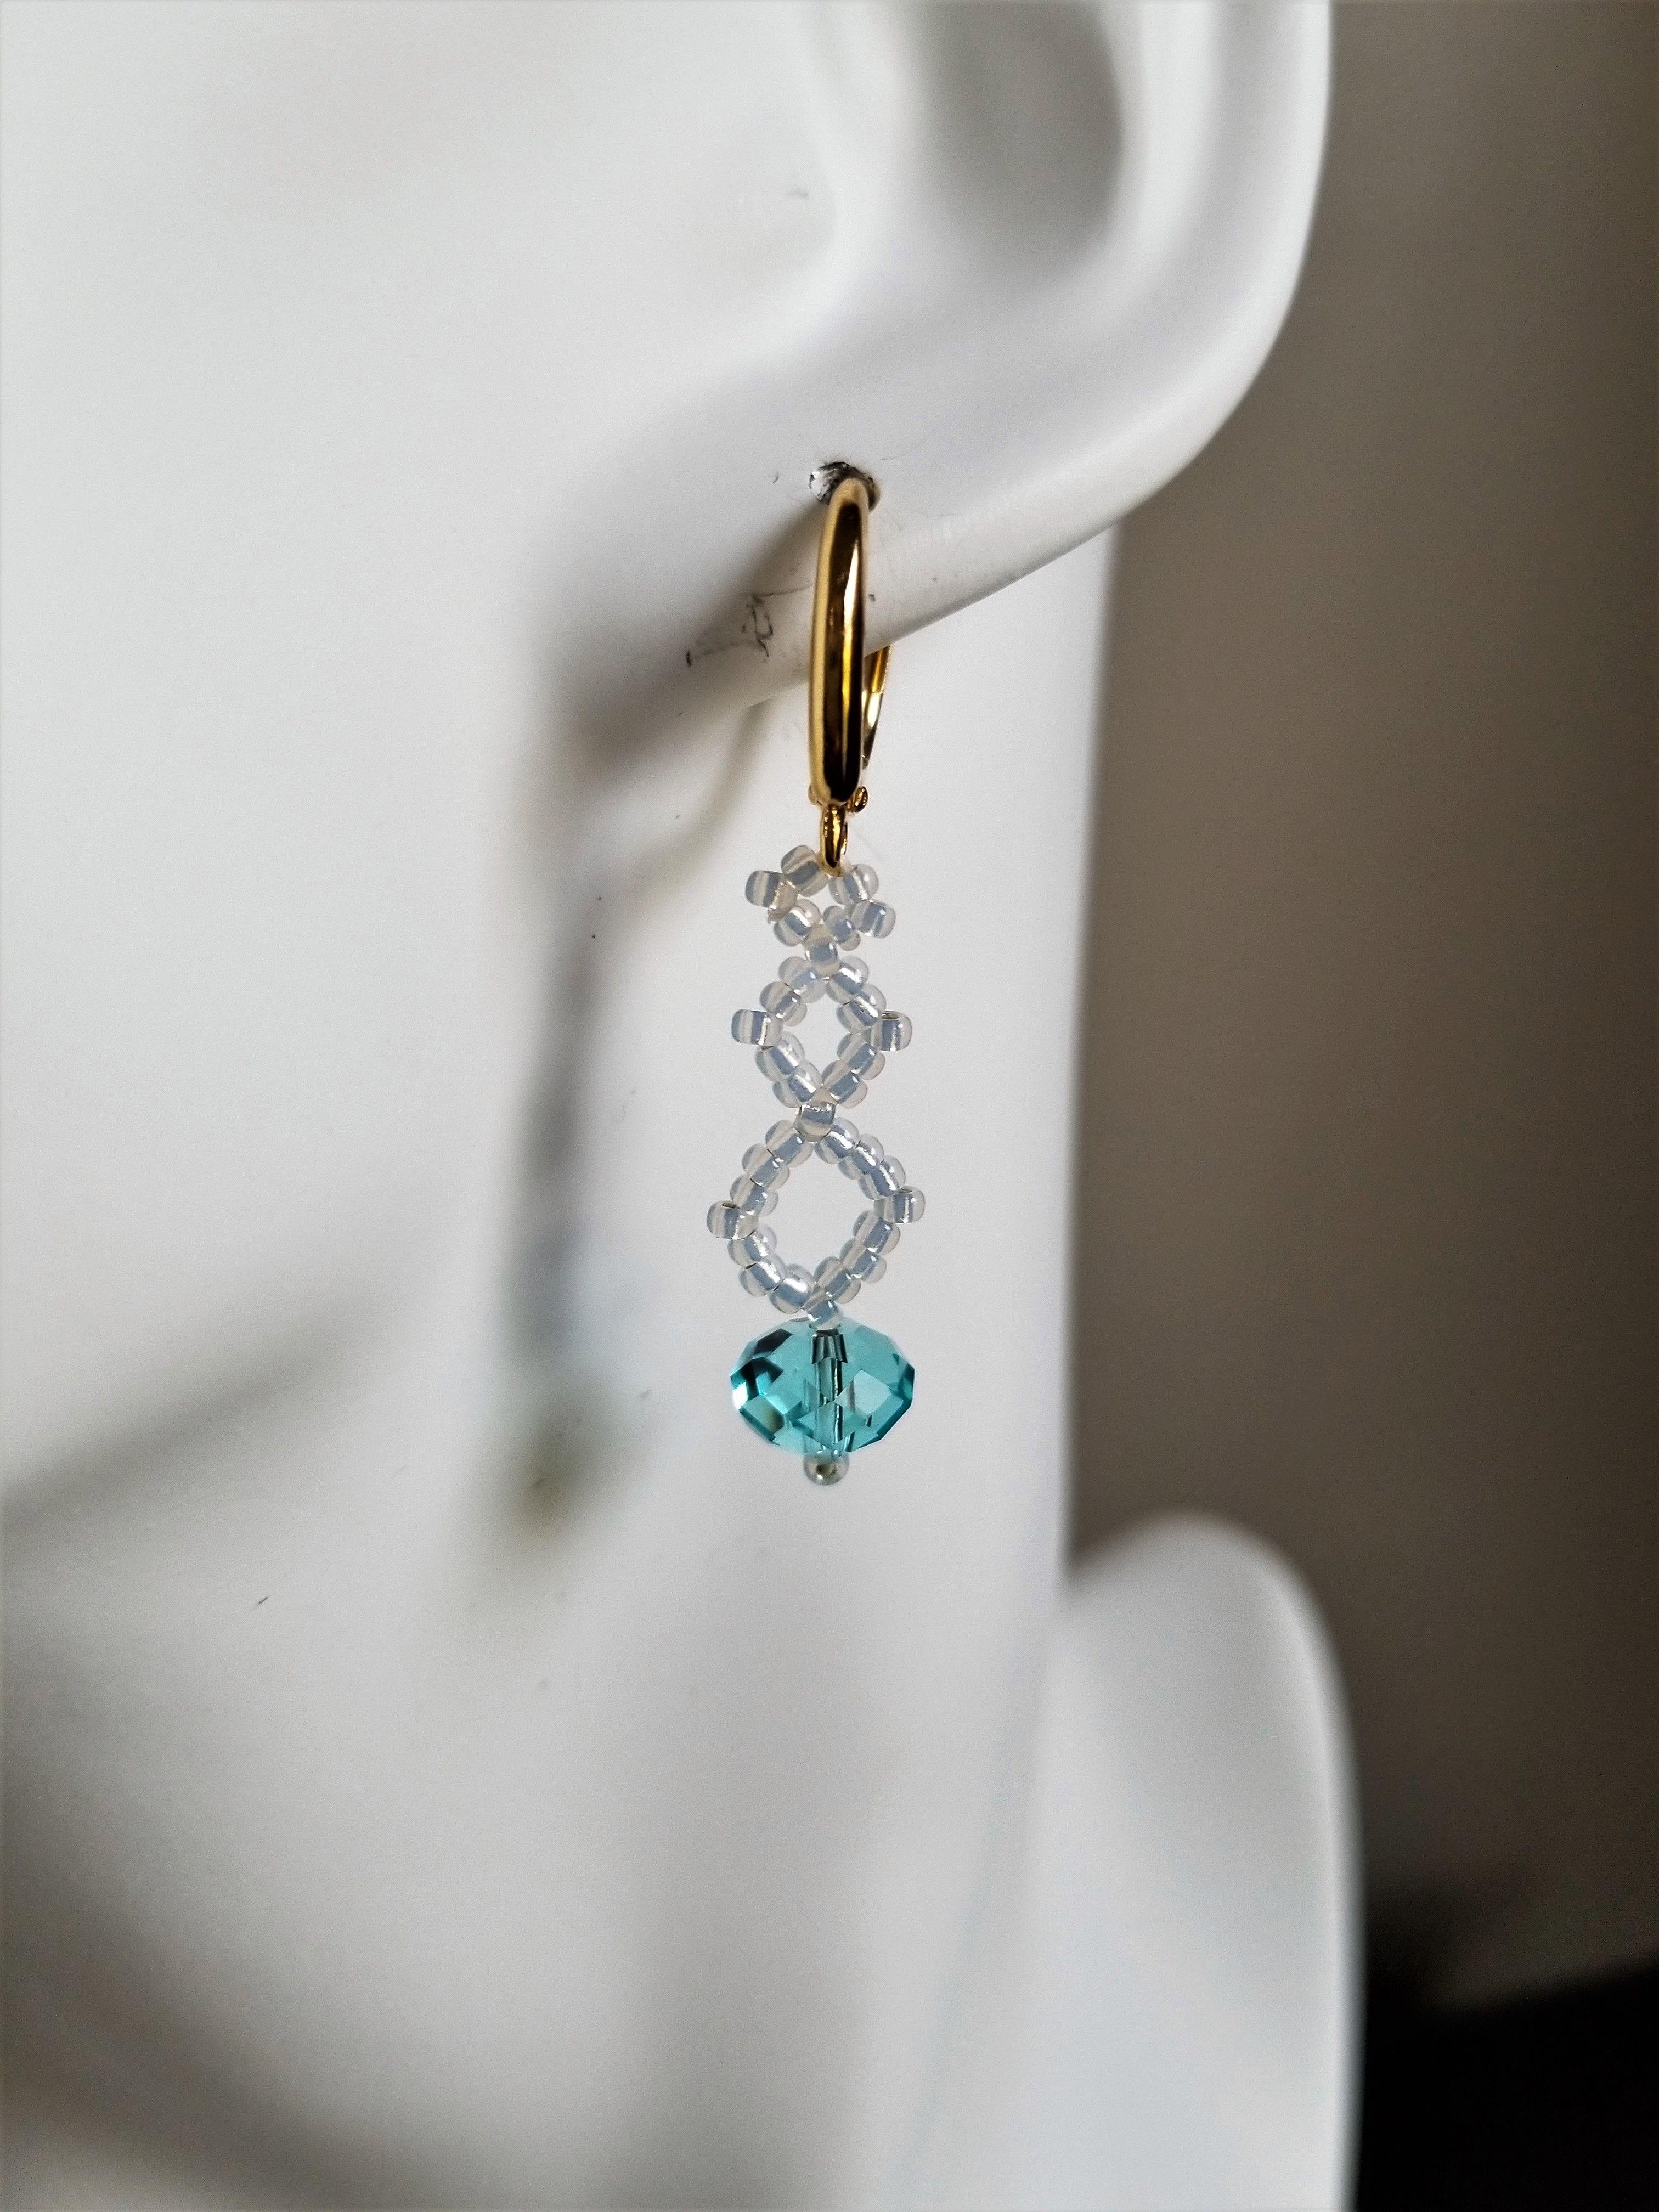 20a541b169c3a Swarovski Blue Crystal Earrings, Jewelry Gift For Her, Drop Earrings ...